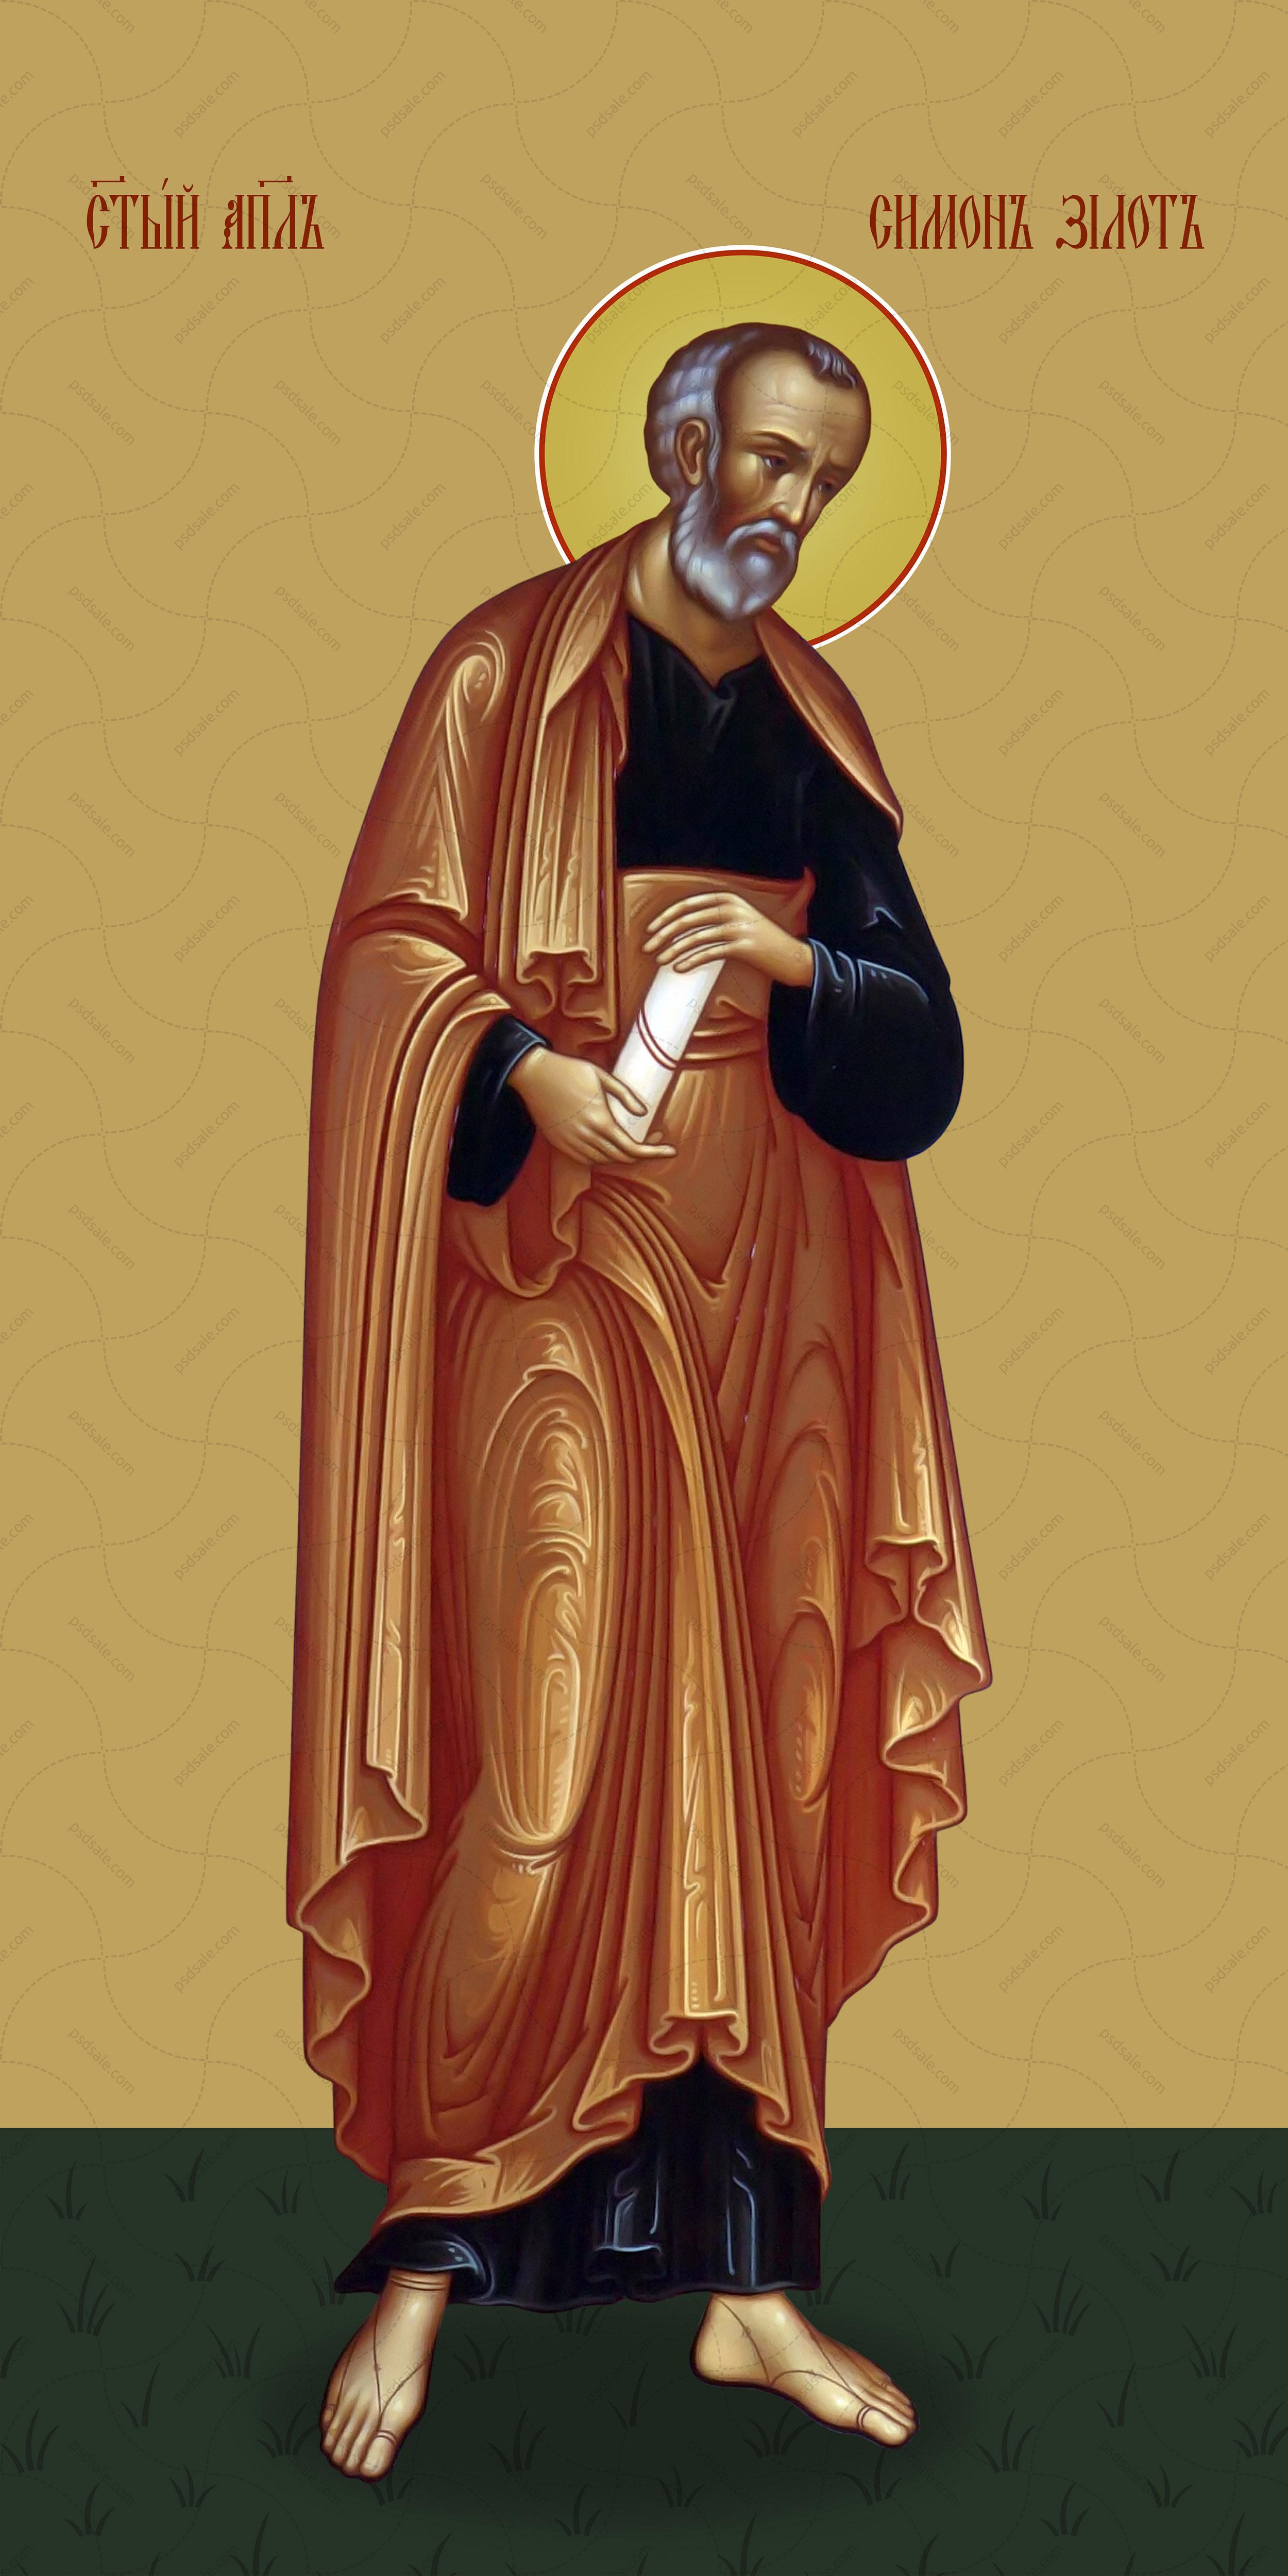 Мерная икона, Симон, апостол